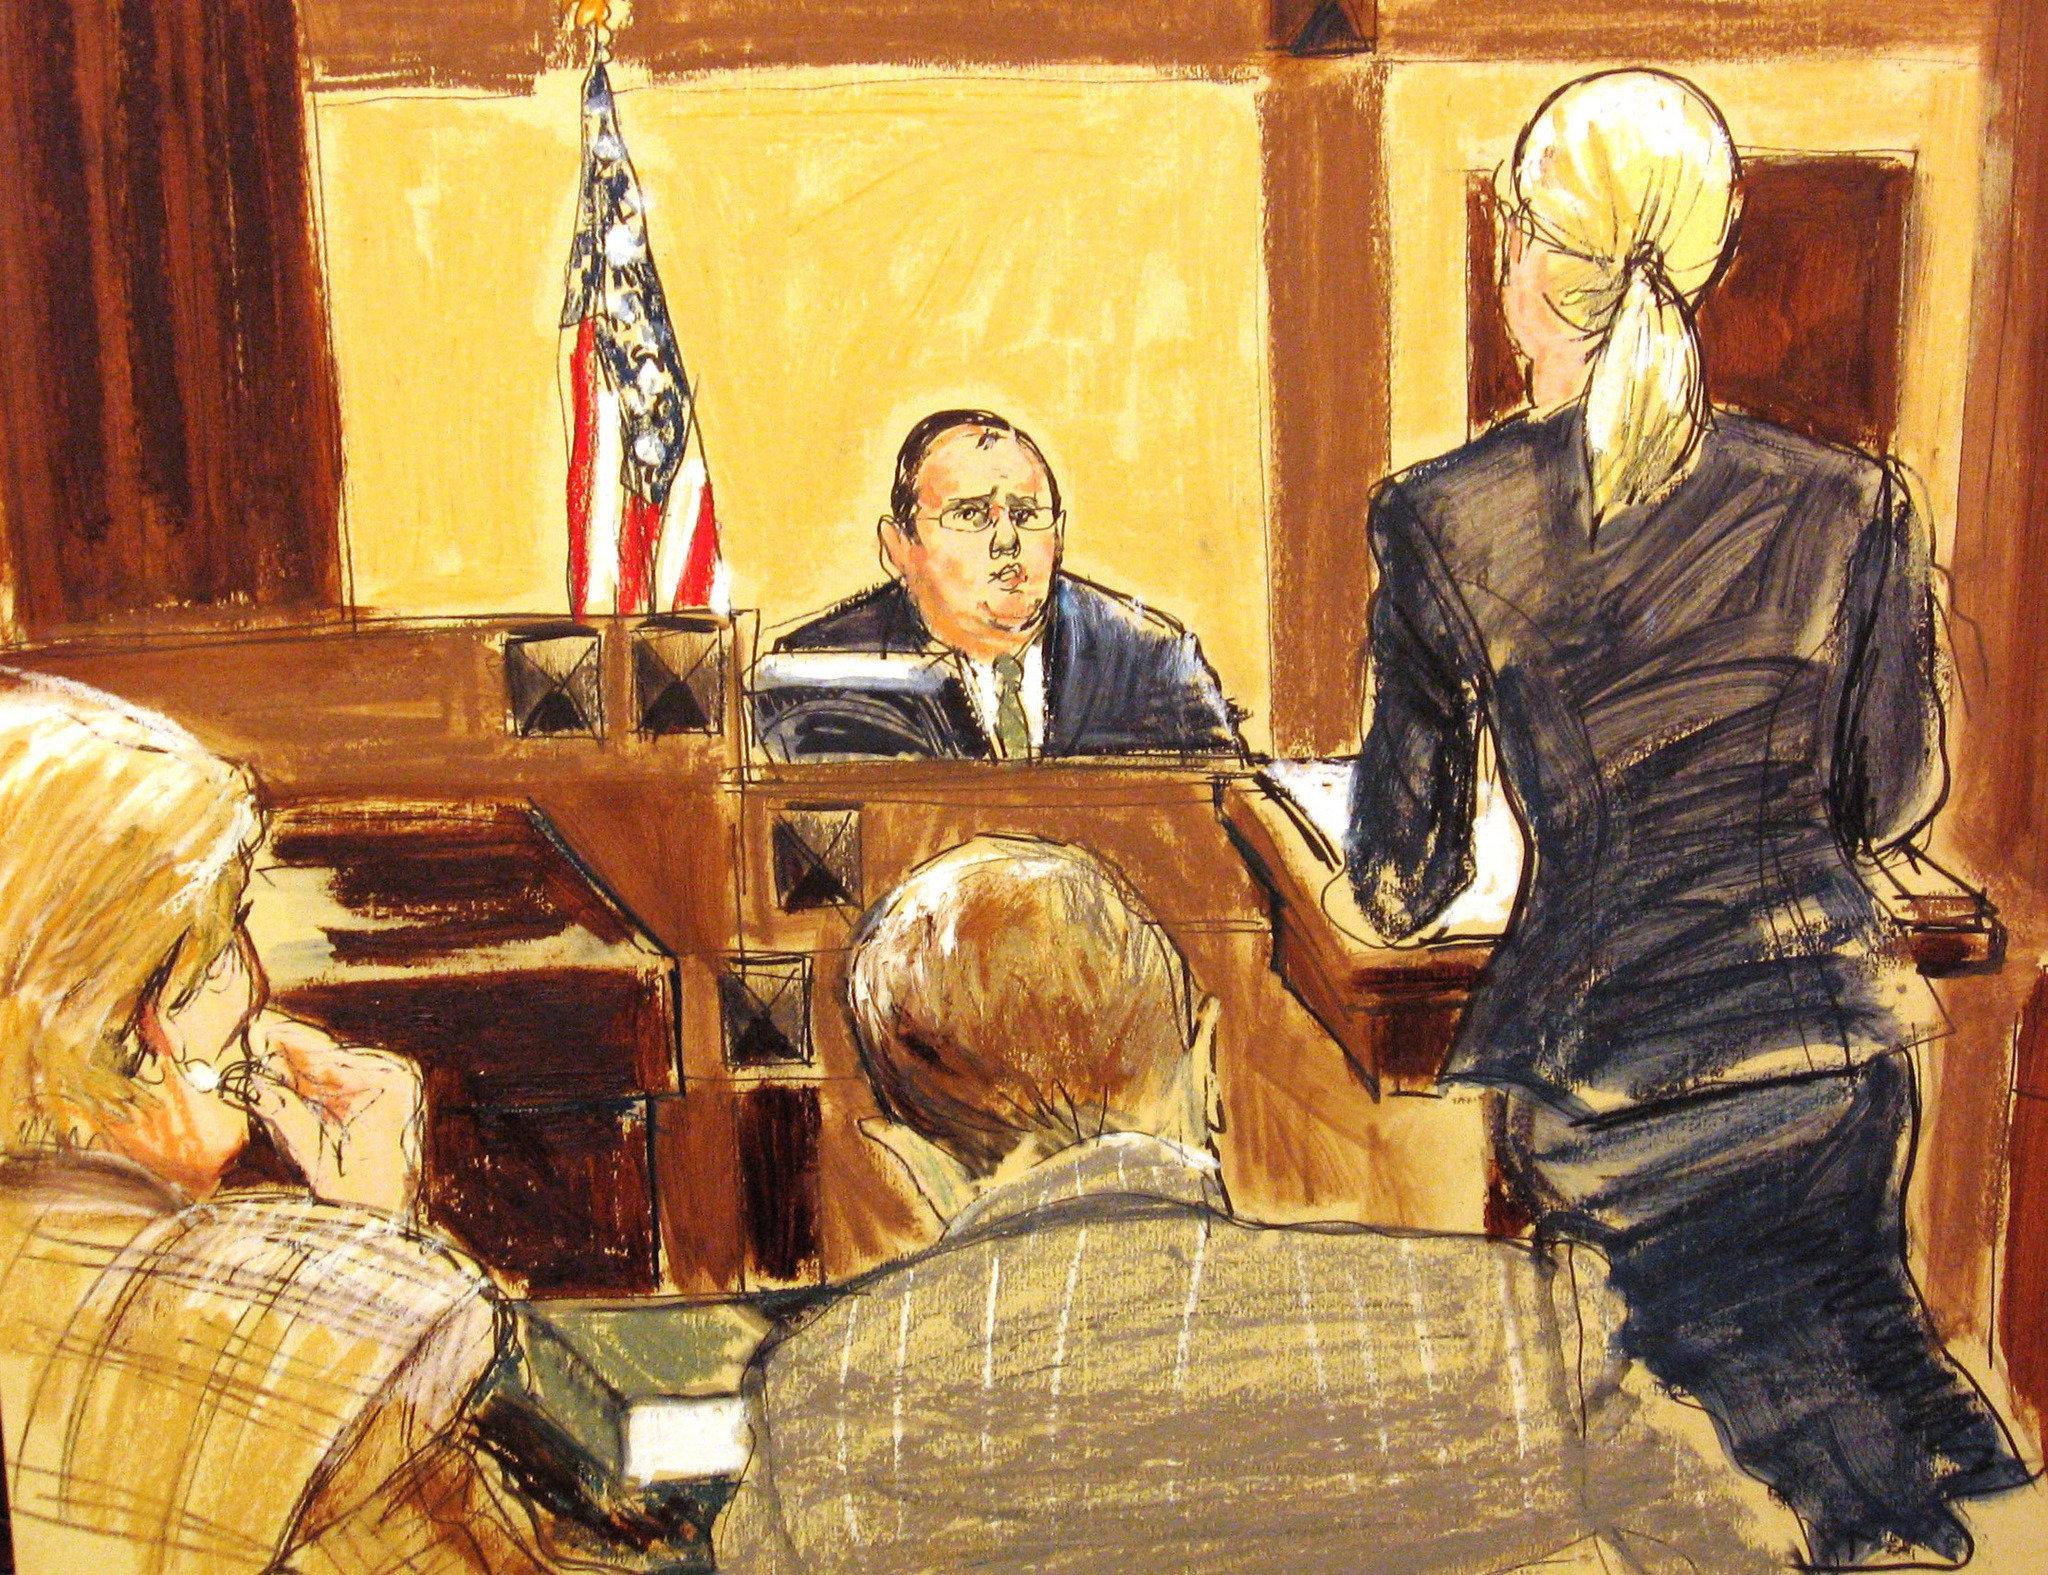 FBI informant Solomon Dwek is mentally ill, his attorney says.